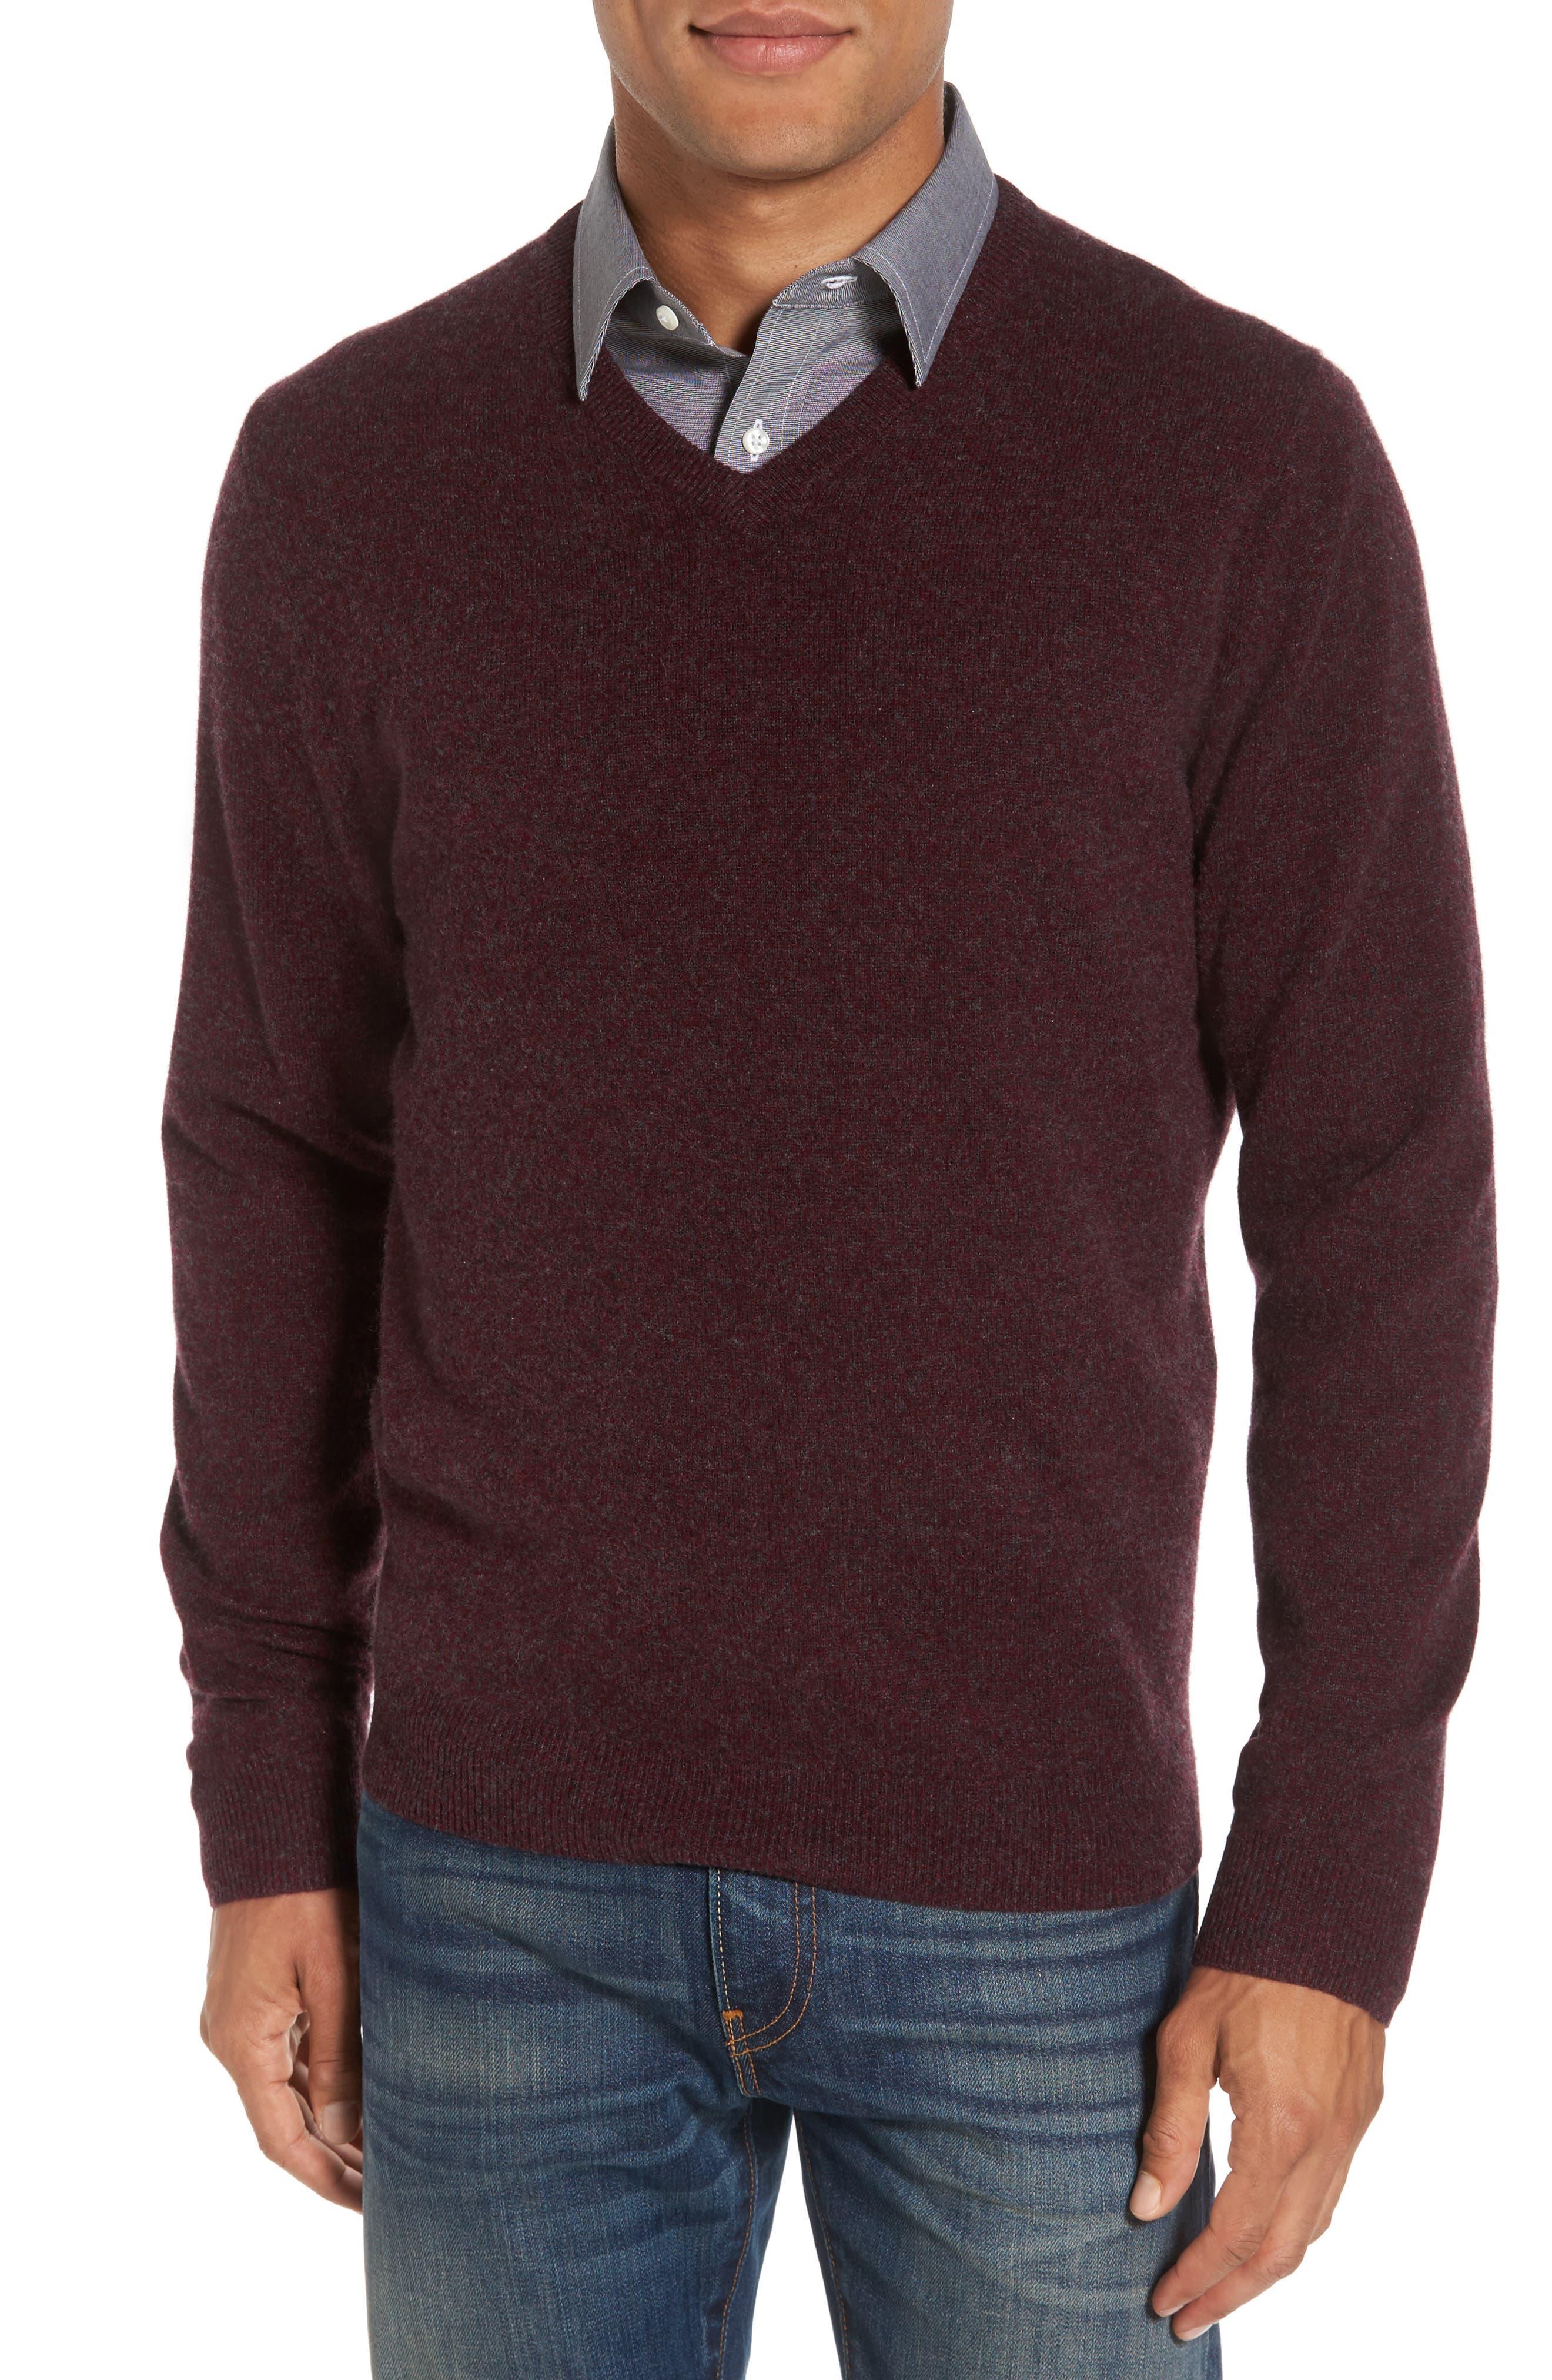 Cashmere V-Neck Sweater,                         Main,                         color, Burgundy Fudge